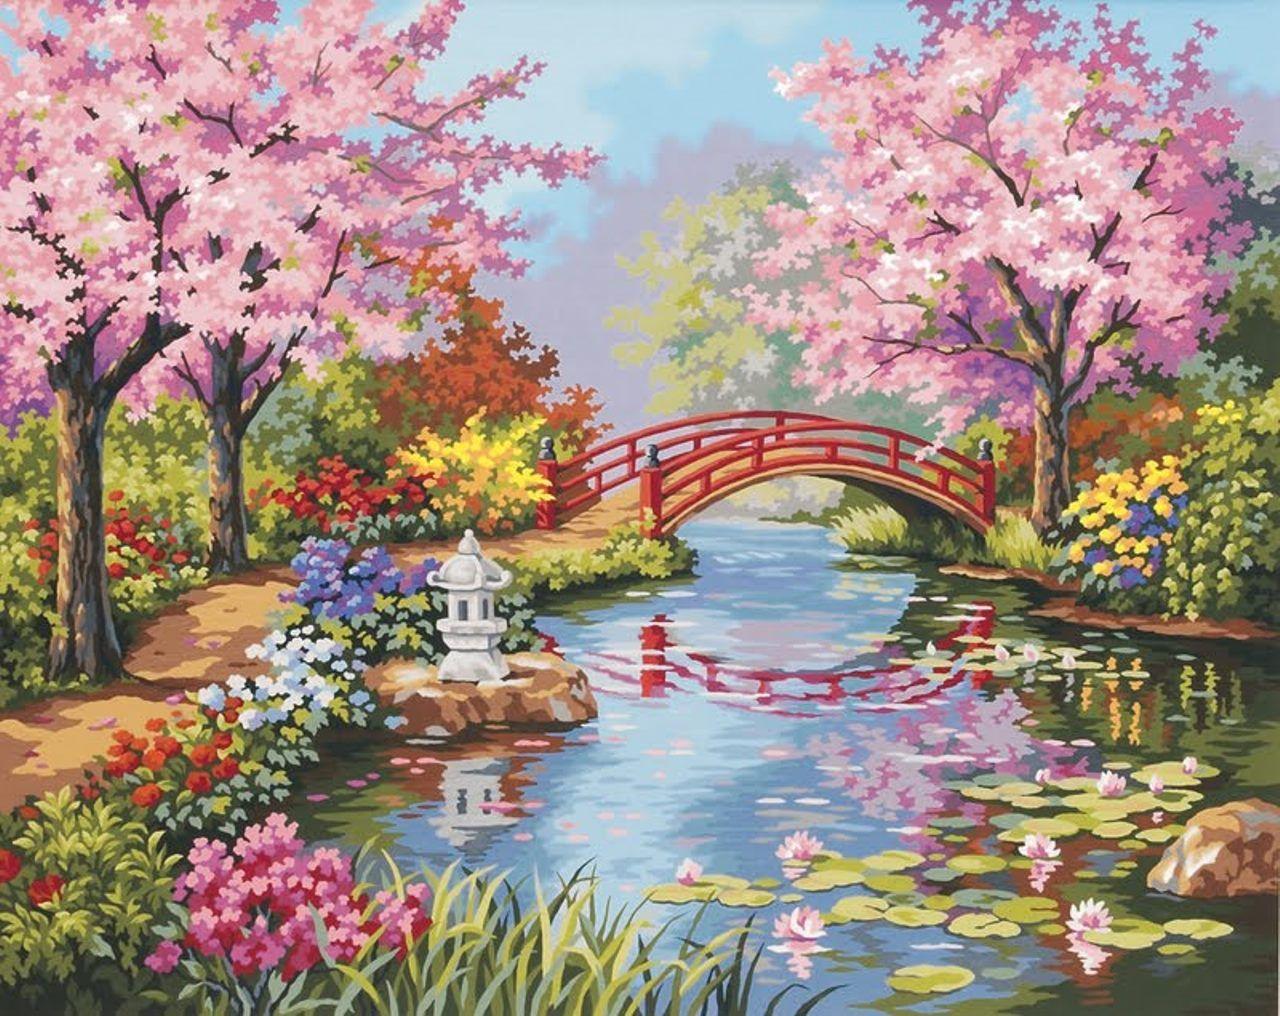 home ideas for flower garden paintings for kids - Simple Flower Garden Paintings